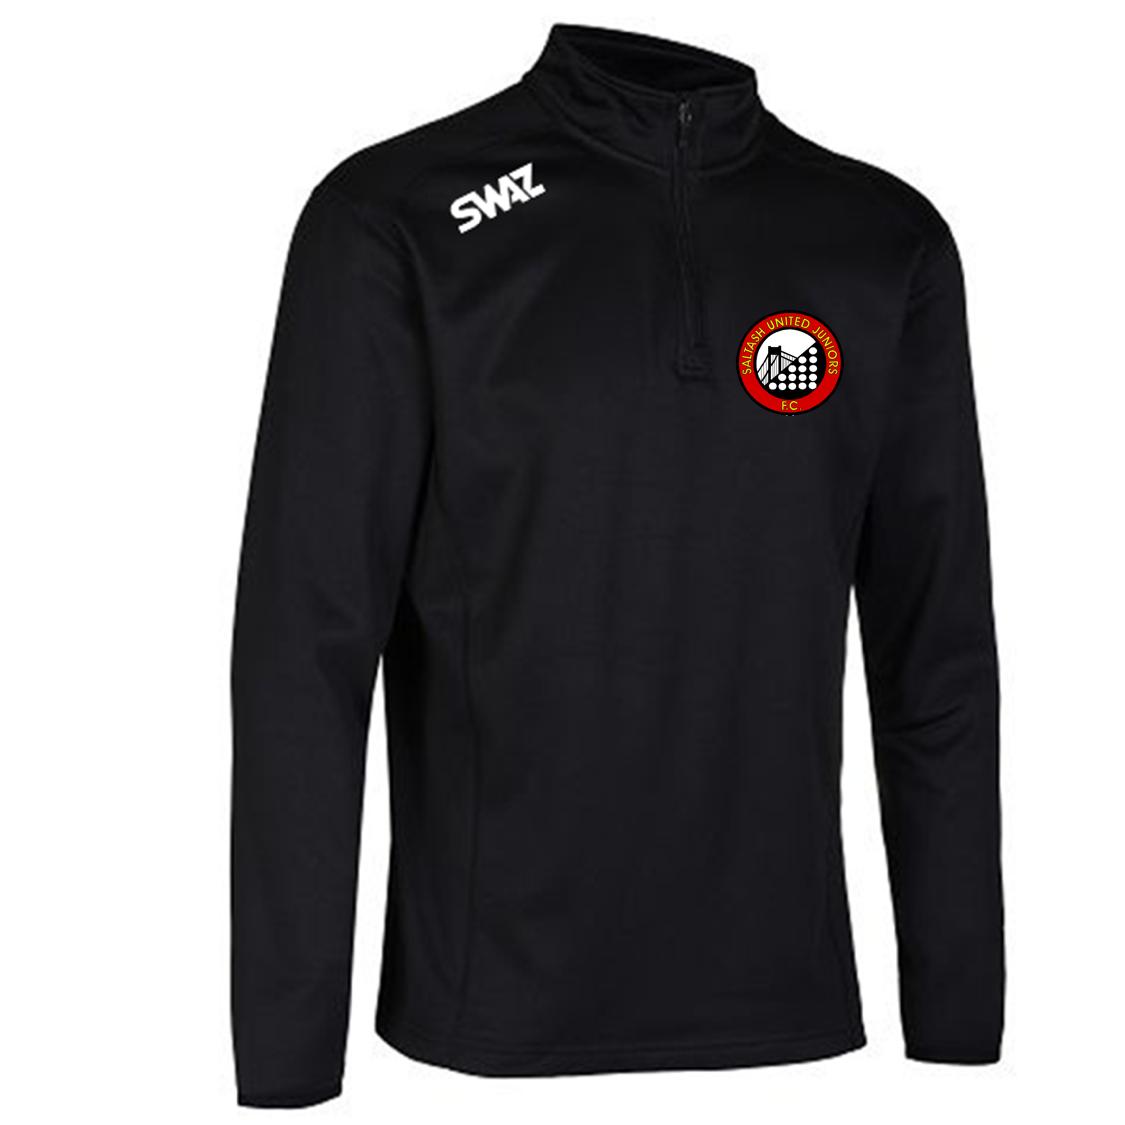 SWAZ Saltash United Juniors Youth Club 1/4 Zip Midlayer Top – Black